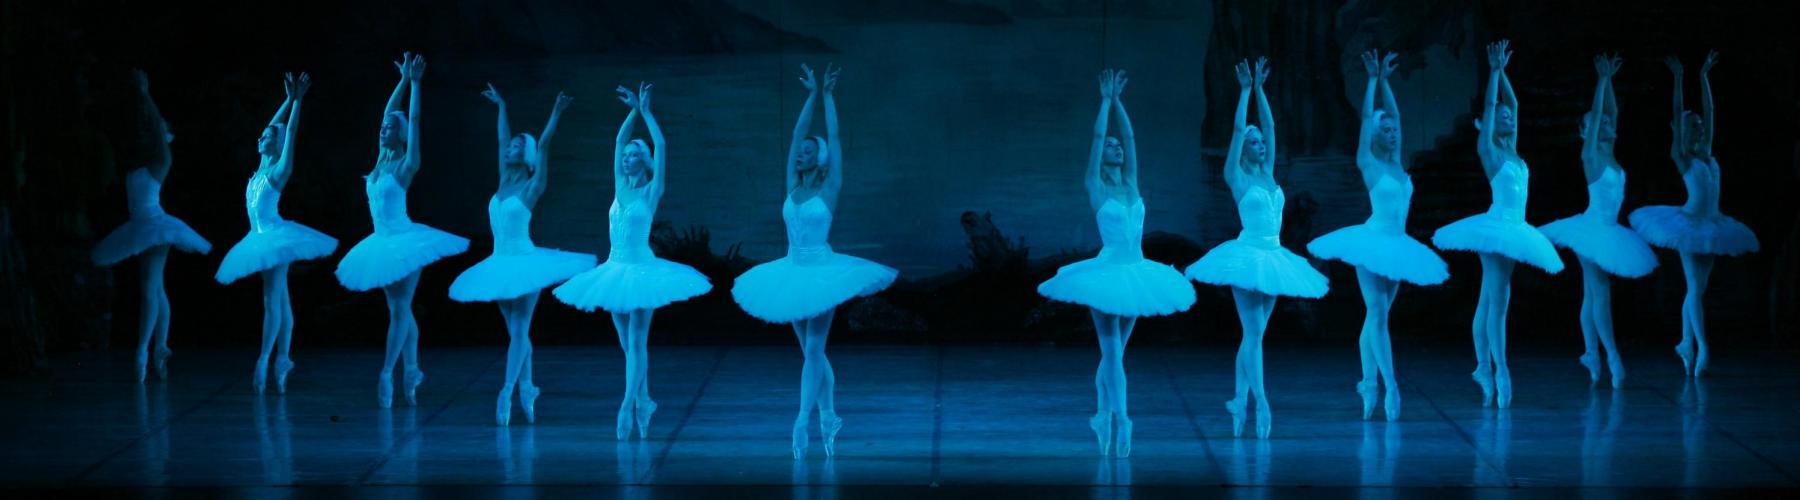 EuroTourGuide Coach Tour 10th November Swan Lake Russian National Ballet Cartagena